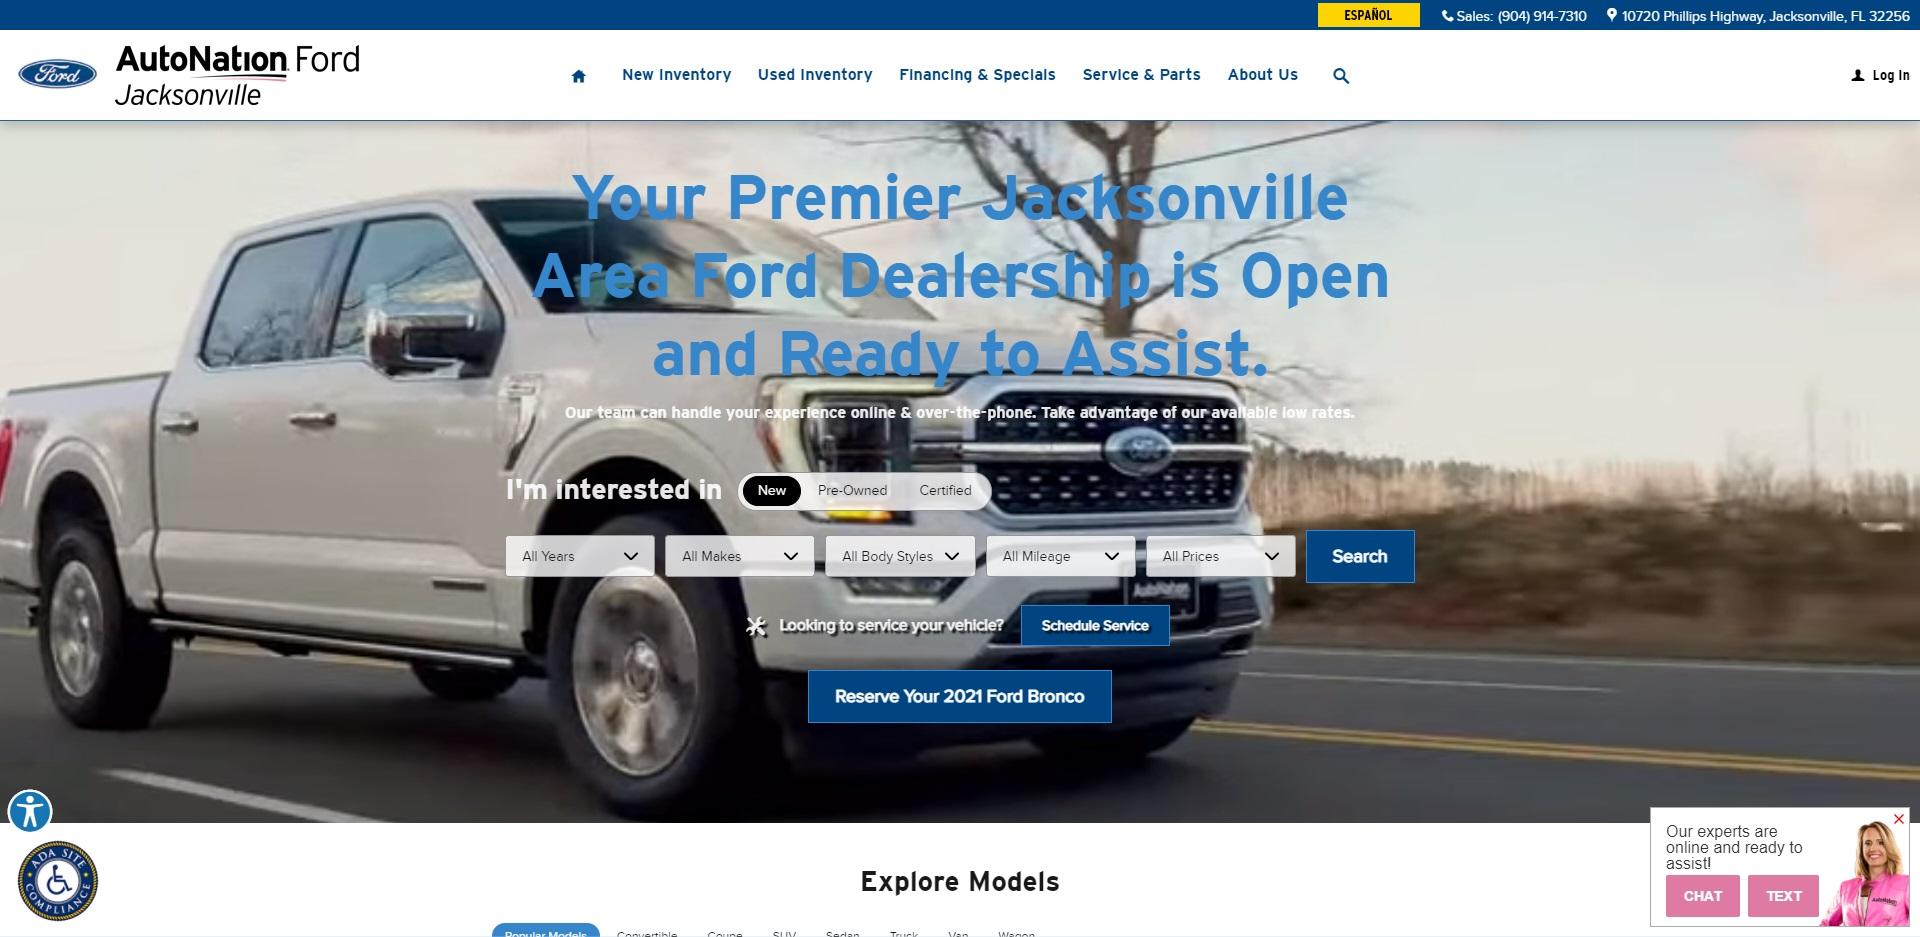 Best Ford Dealers in Jacksonville, FL